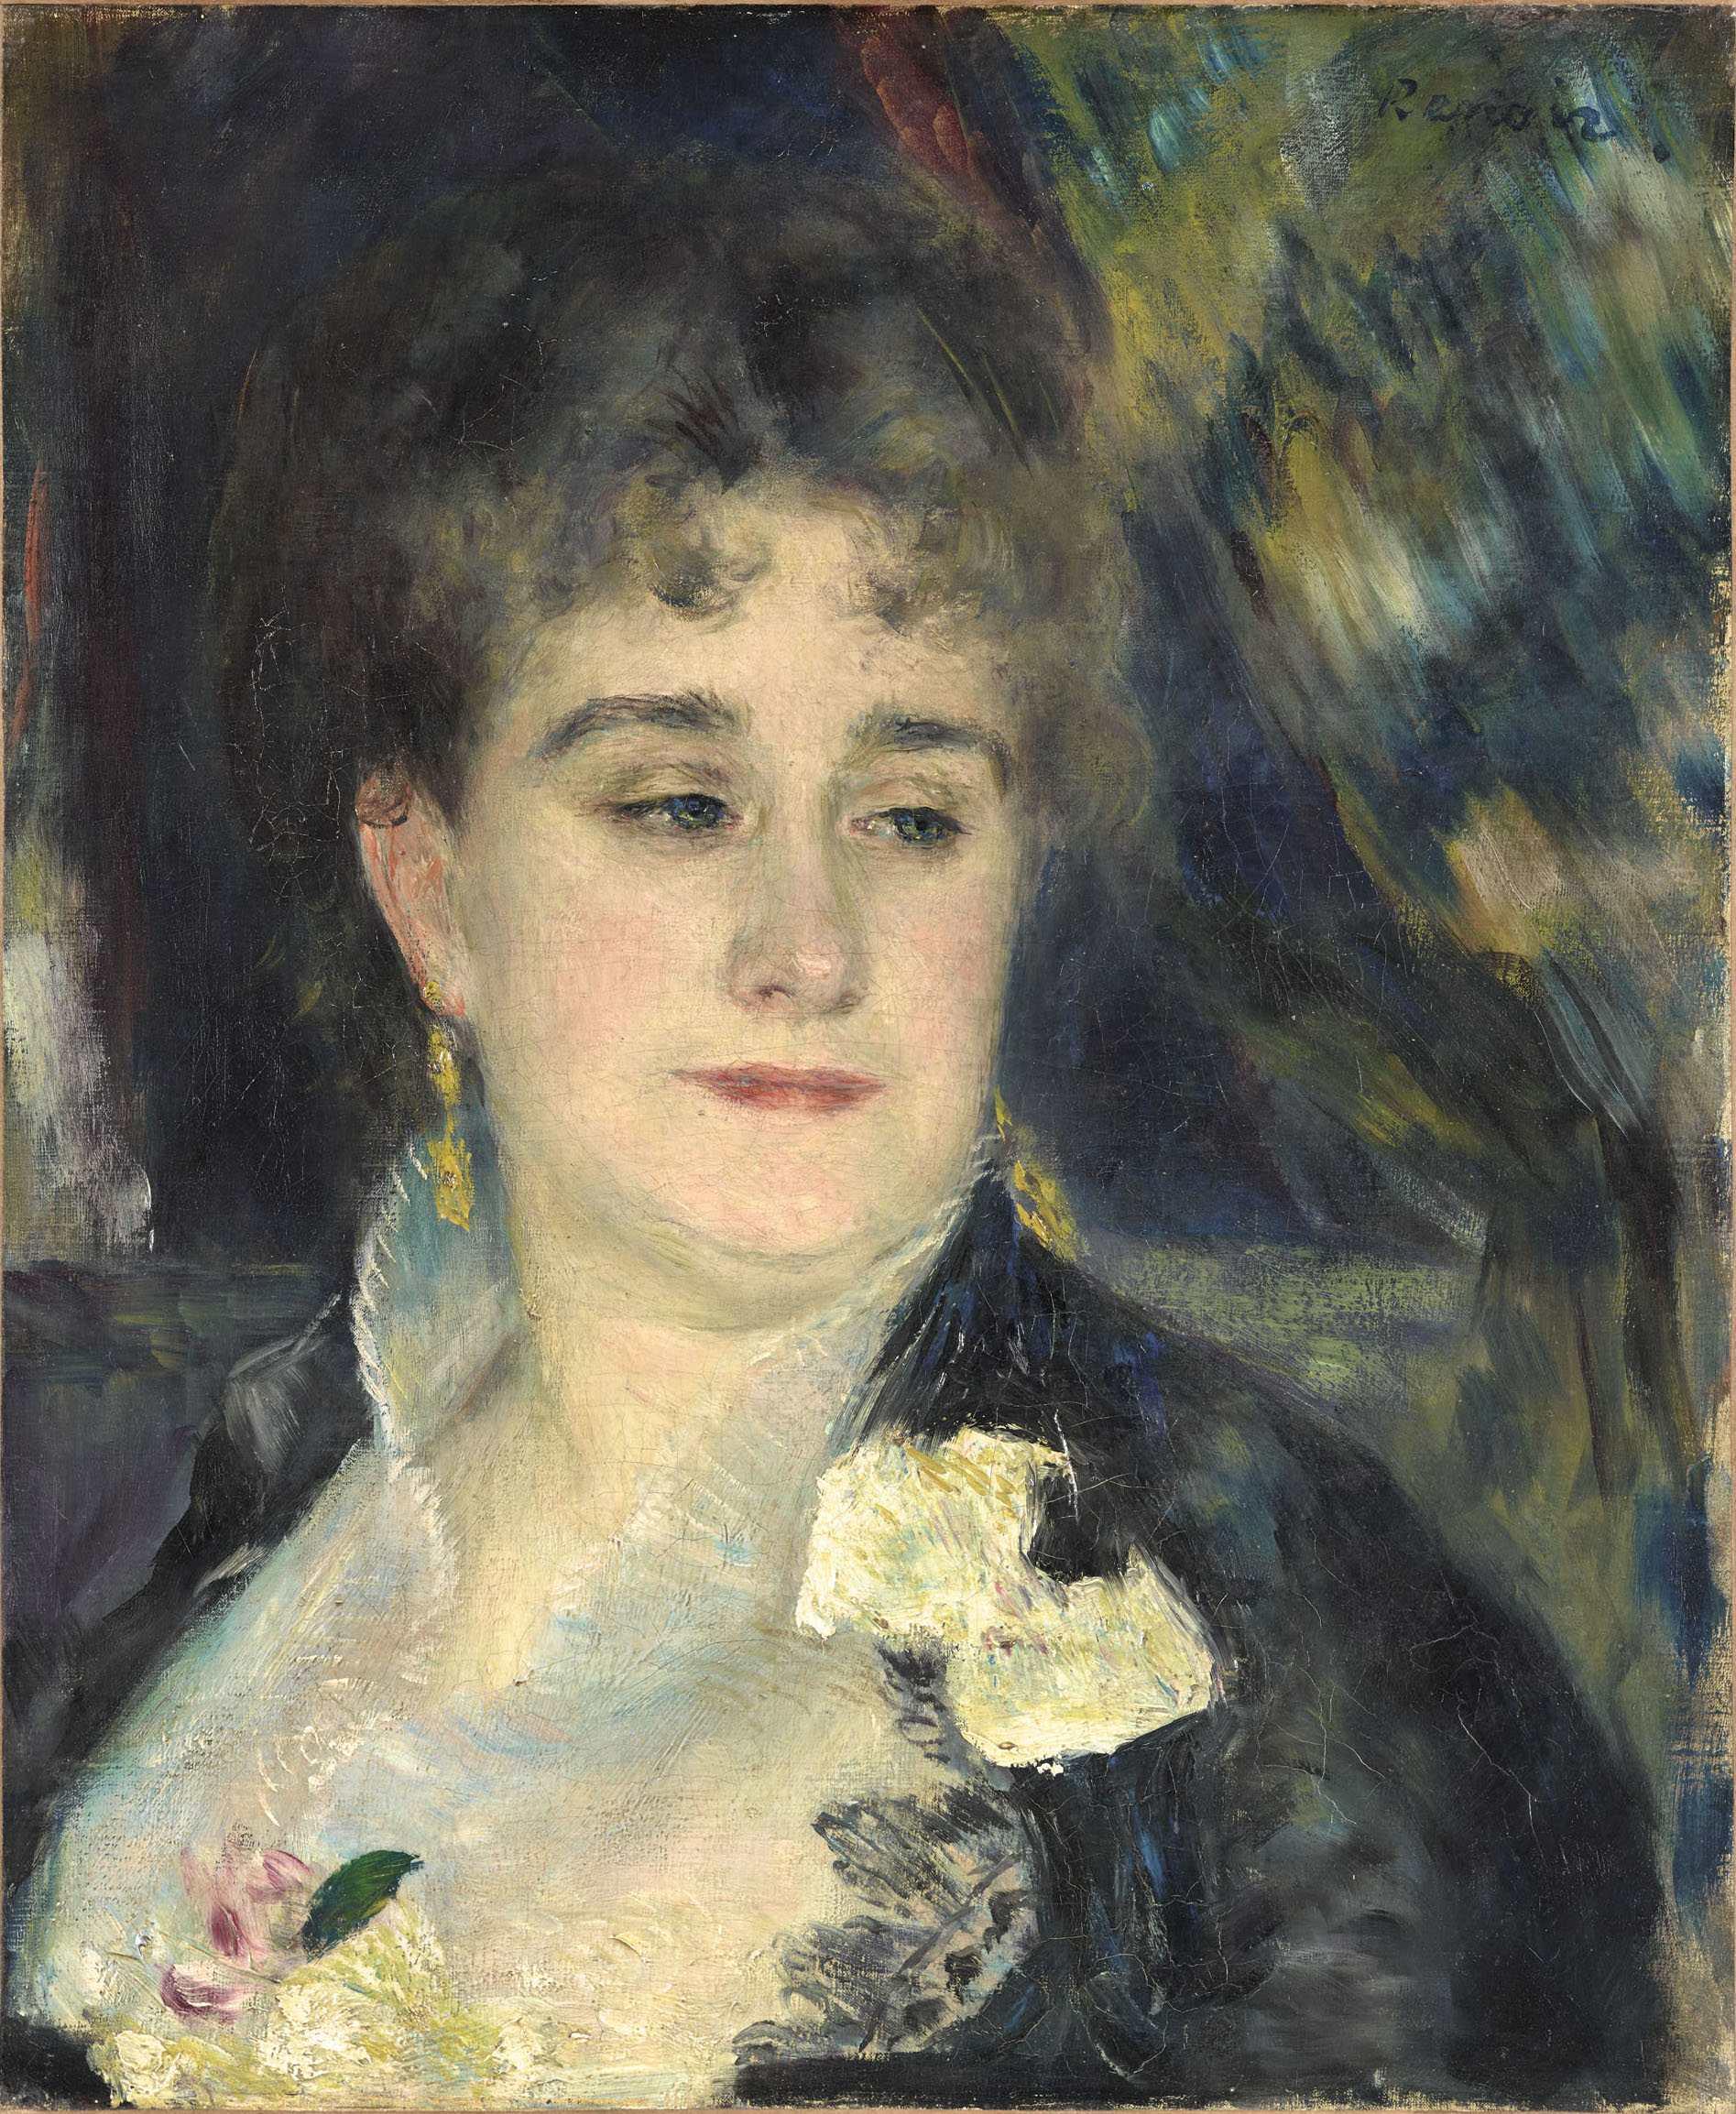 Pierre-Auguste Renoir, Madame Georges Charpentier, 1876-1877, olio su tela, 46x38 cm, Musée d'Orsay, Parigi (RF 2244) © Adrien Didierjean RMN-Réunion des Musées Nationaux / distr. Alinari